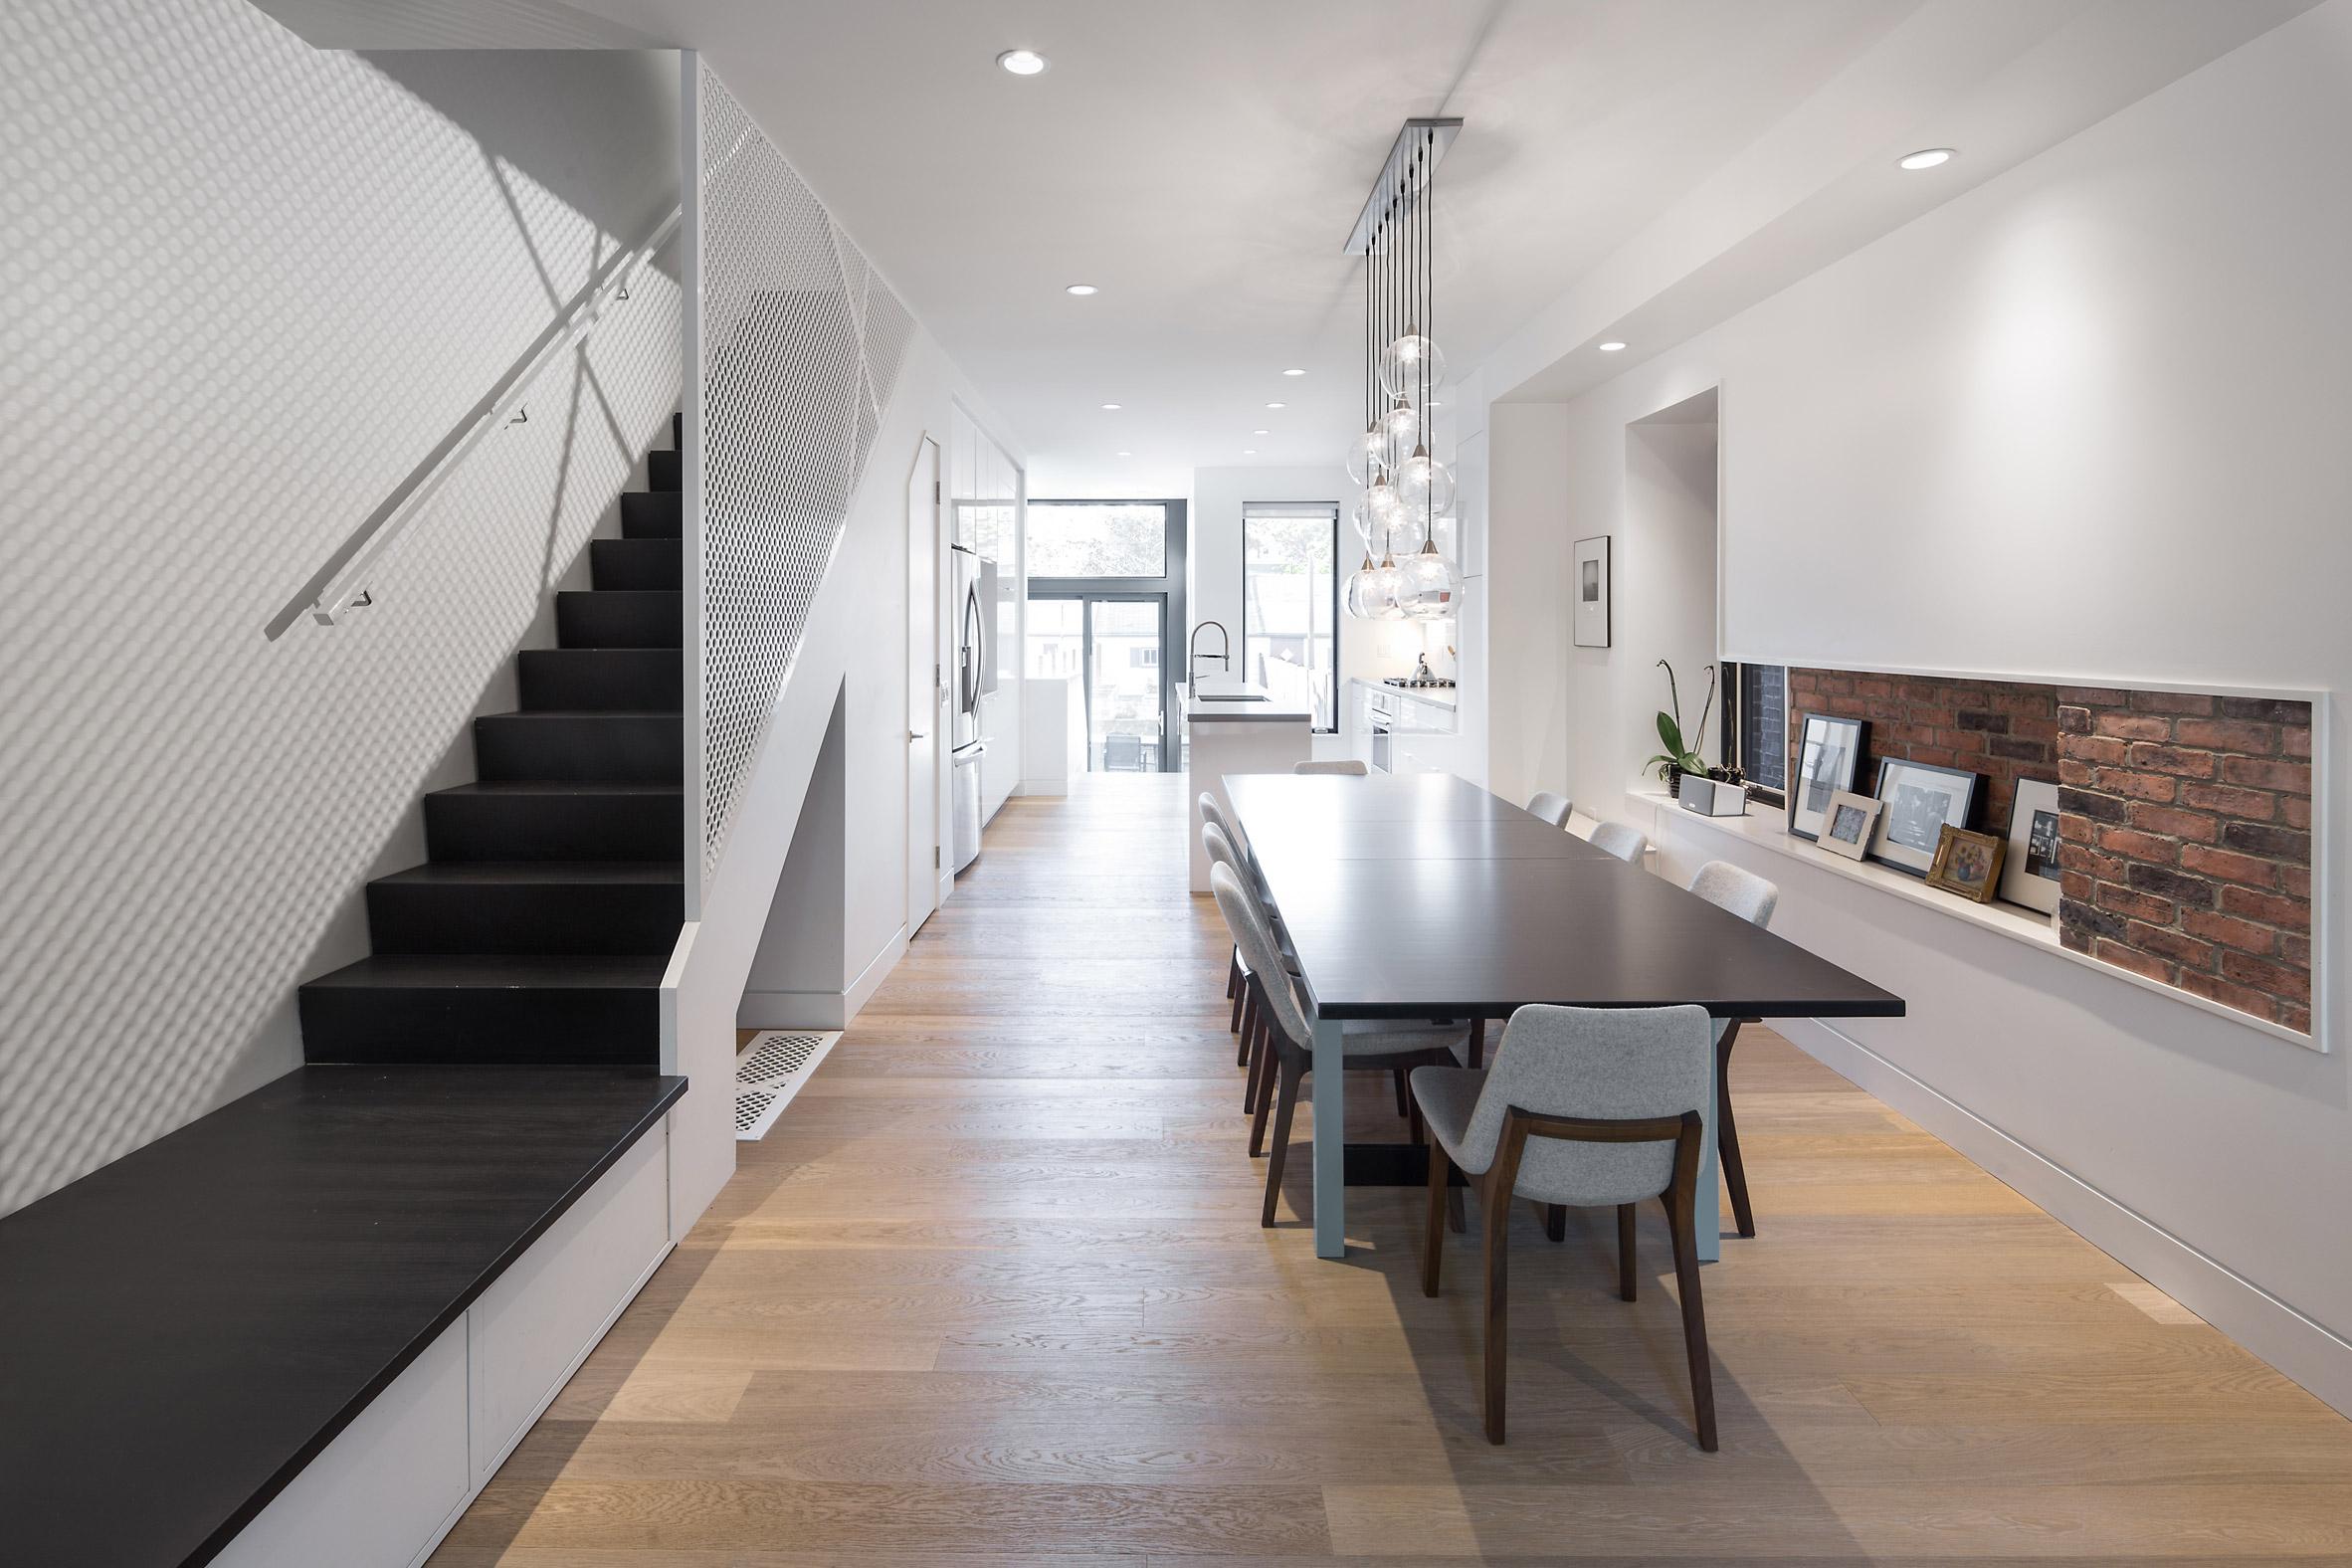 Post Architecture overhauls slender urban home in Toronto